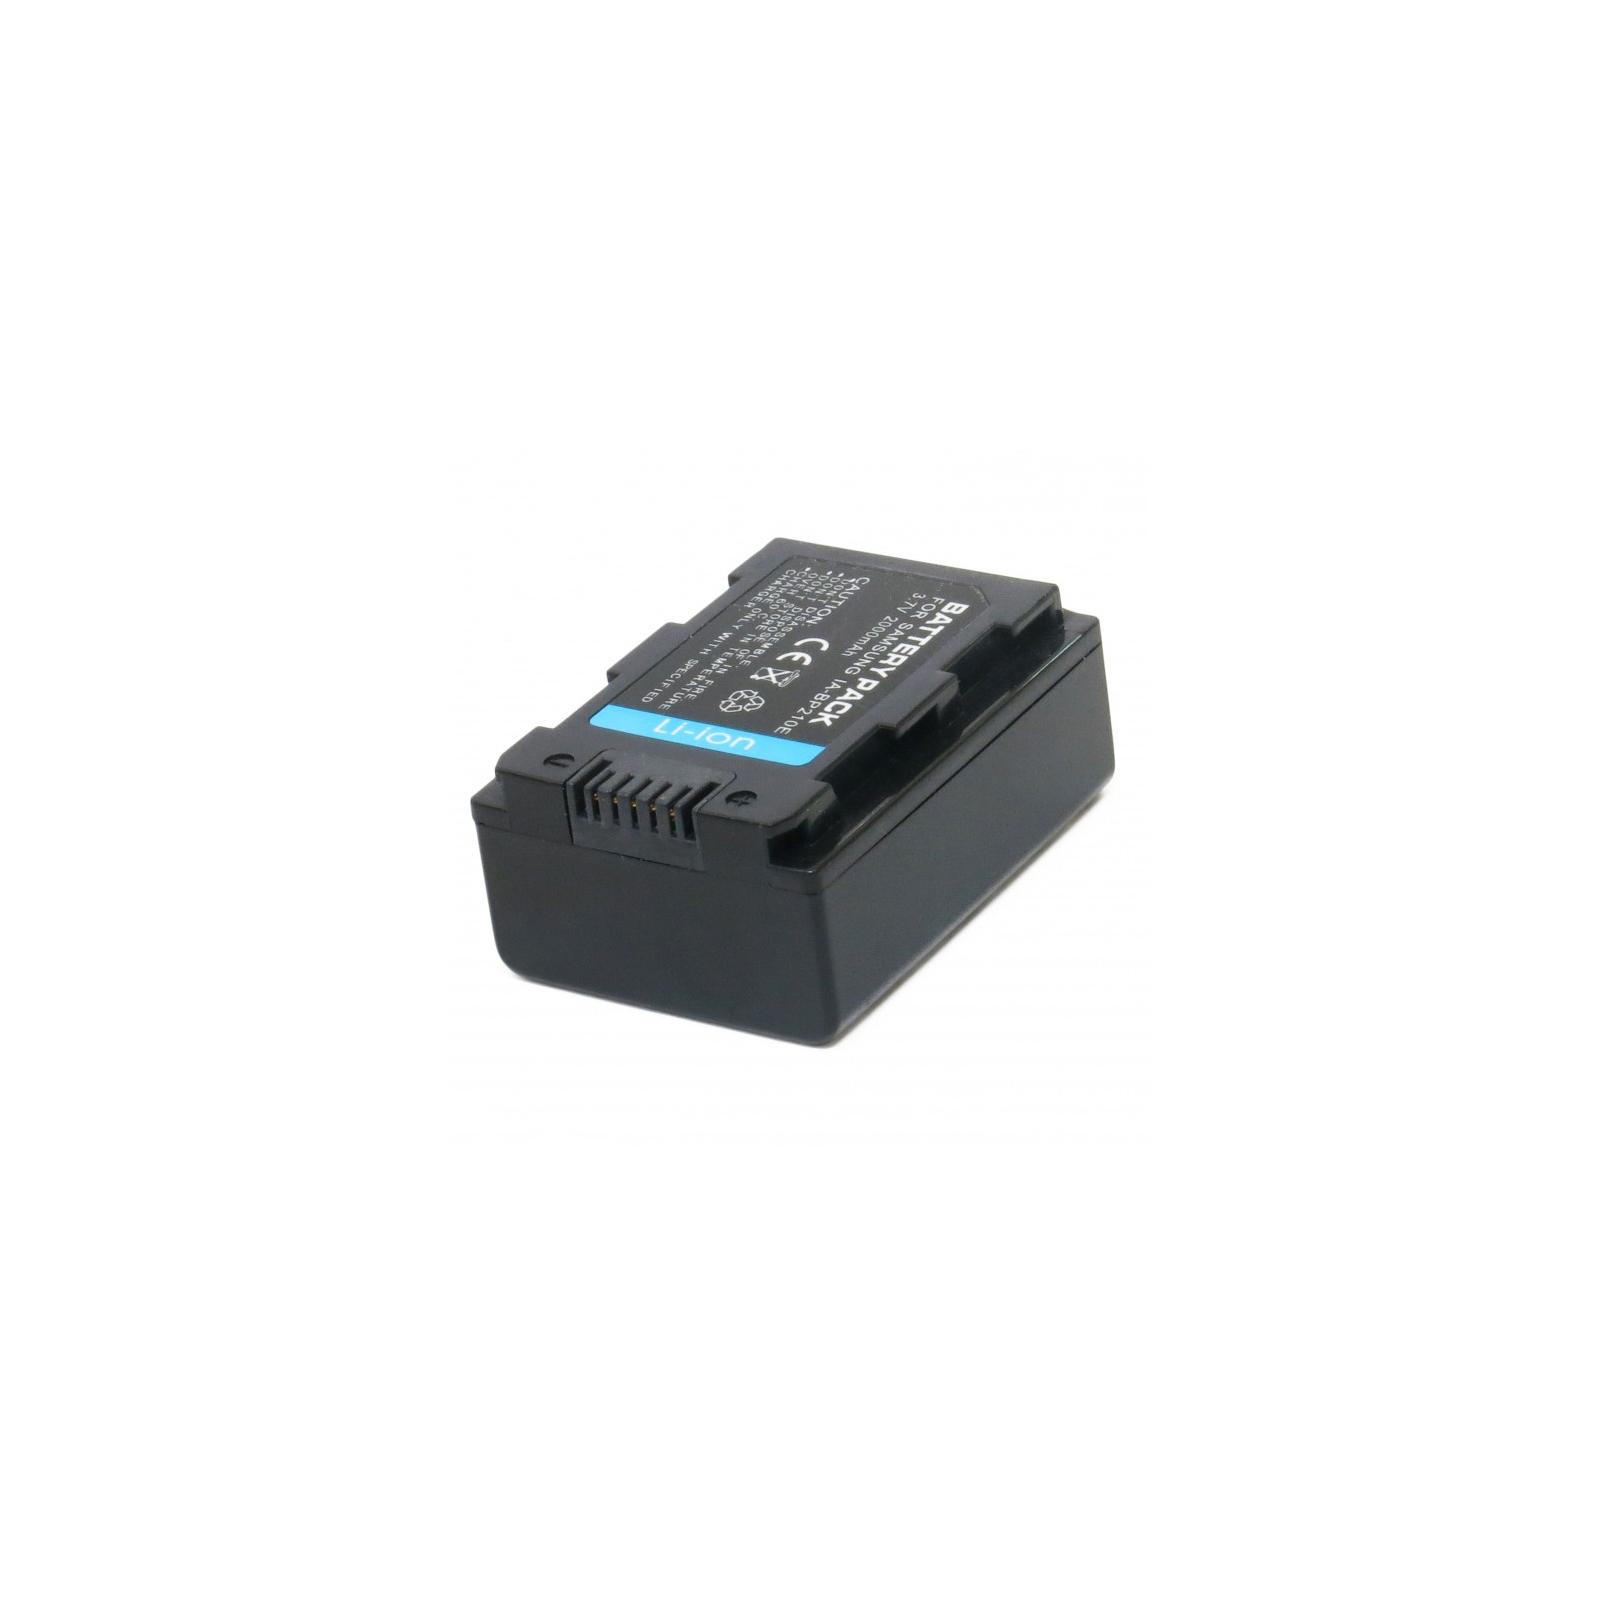 Аккумулятор к фото/видео EXTRADIGITAL Samsung IA-BP210E (DV00DV1285) изображение 4